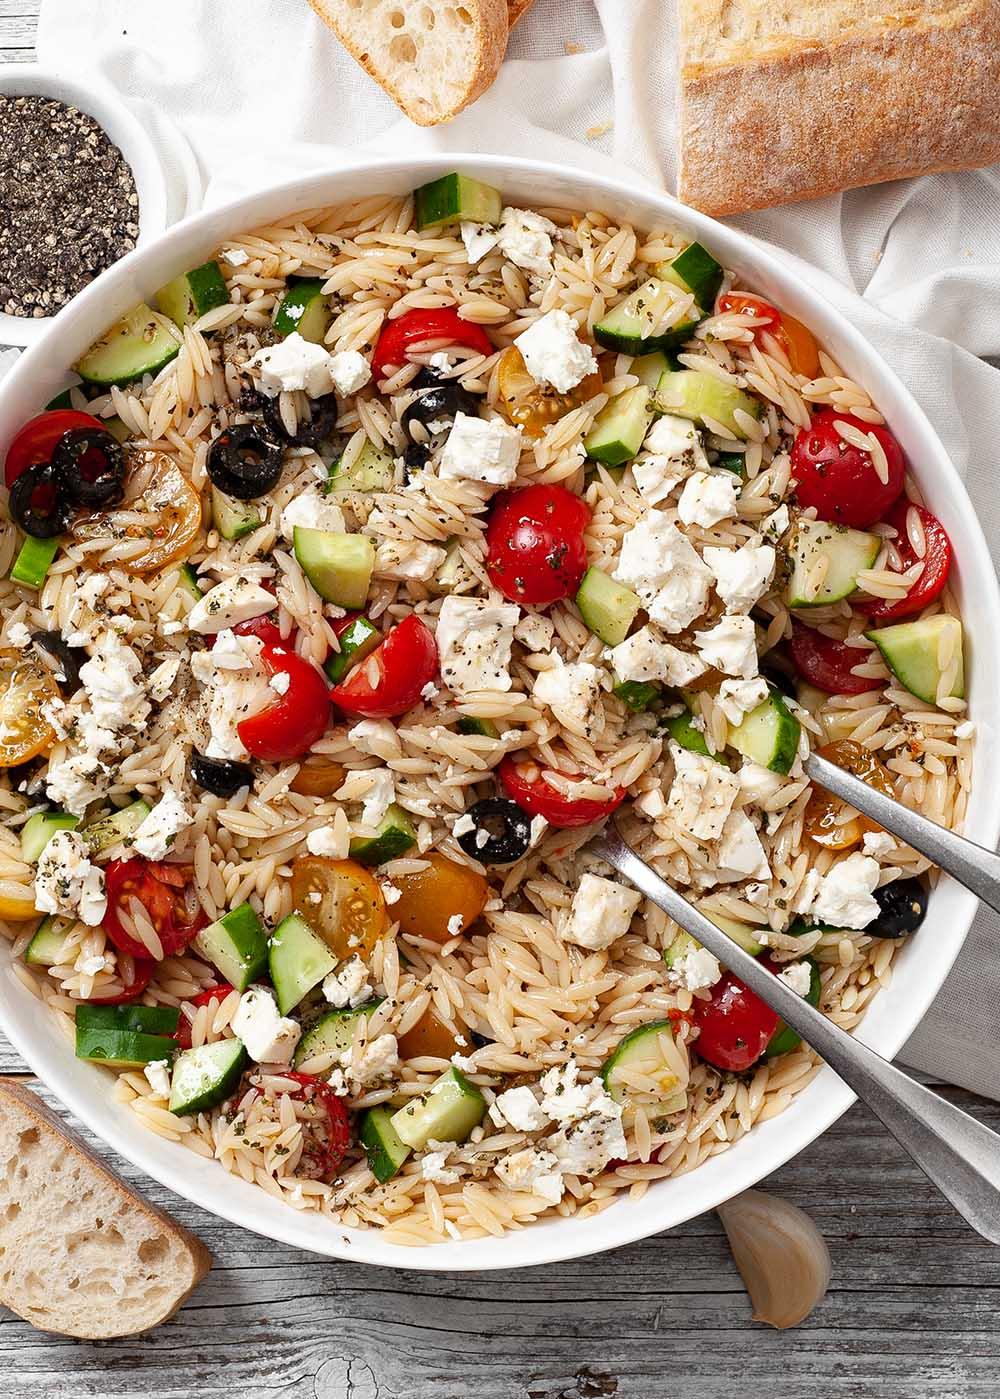 Orzo-Nudelsalat mit Oliven und Feta 2